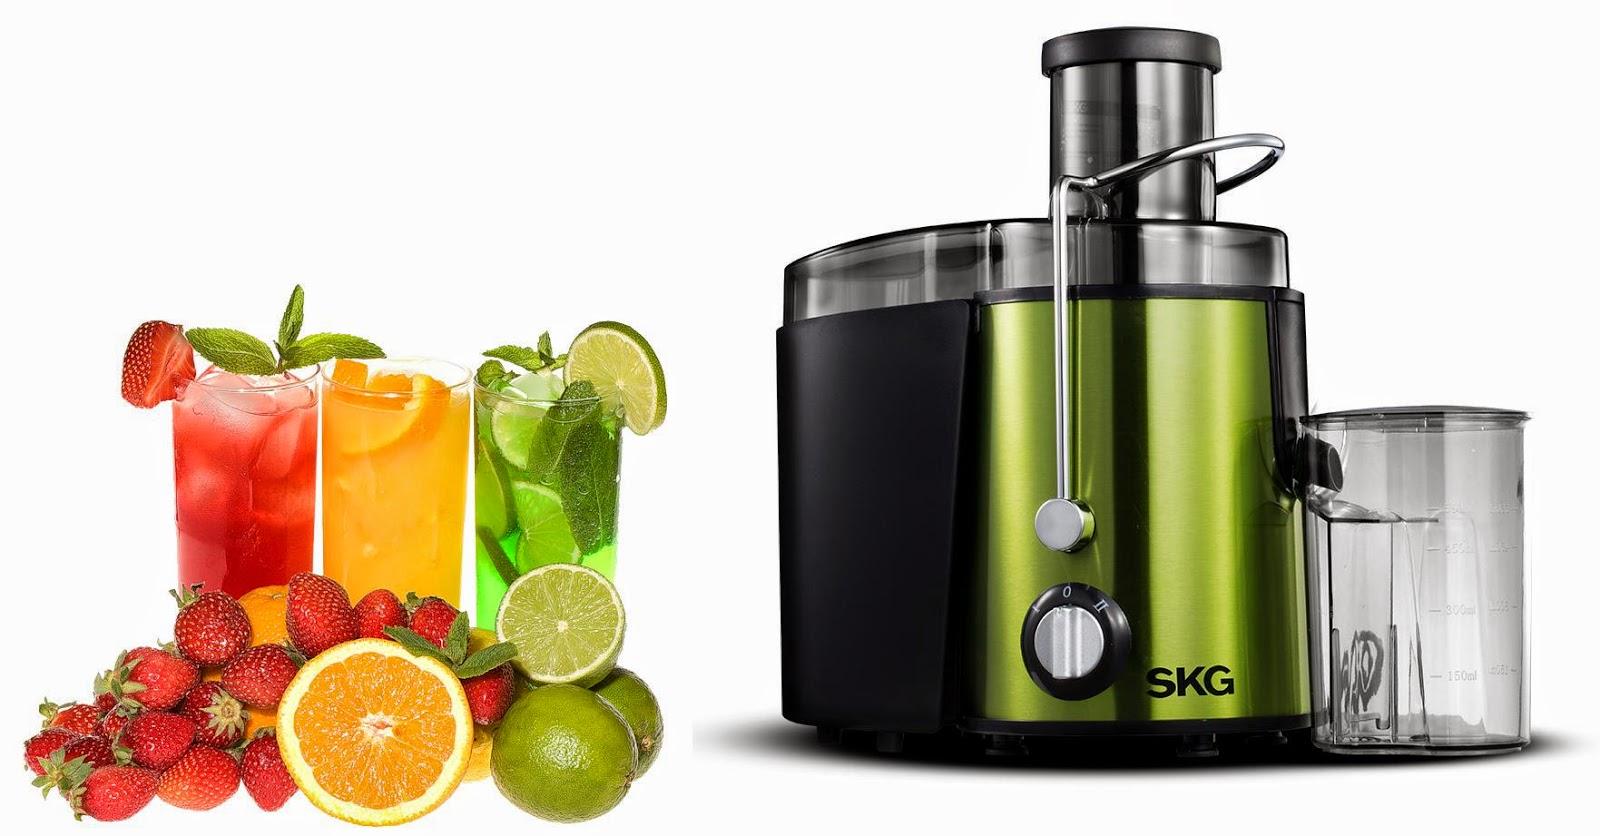 Skg Juicer Slow J 1002 Gold Cheap Top Gs310l Green Review